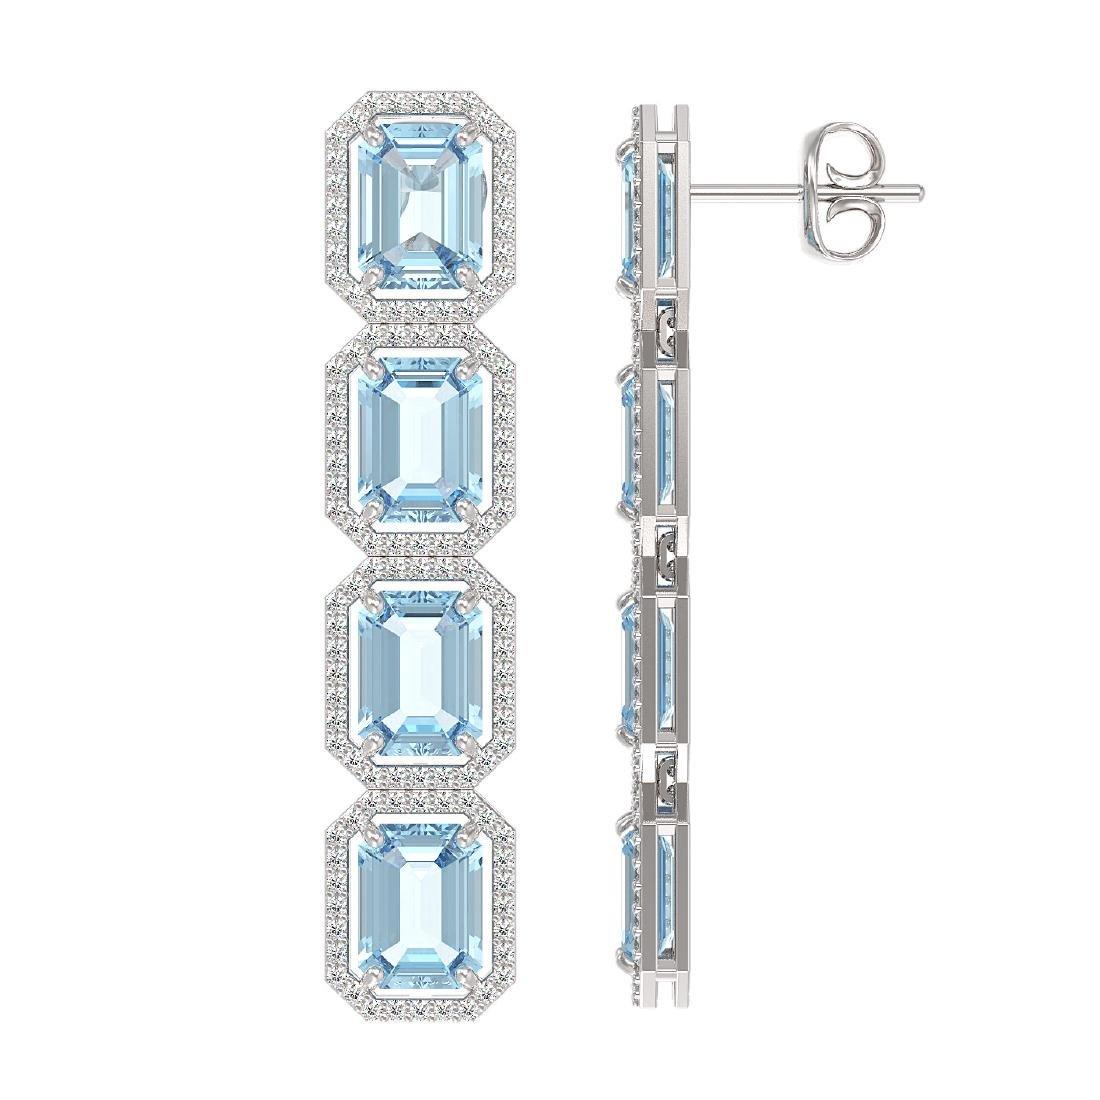 19.49 CTW Aquamarine & Diamond Halo Earrings 10K White - 2